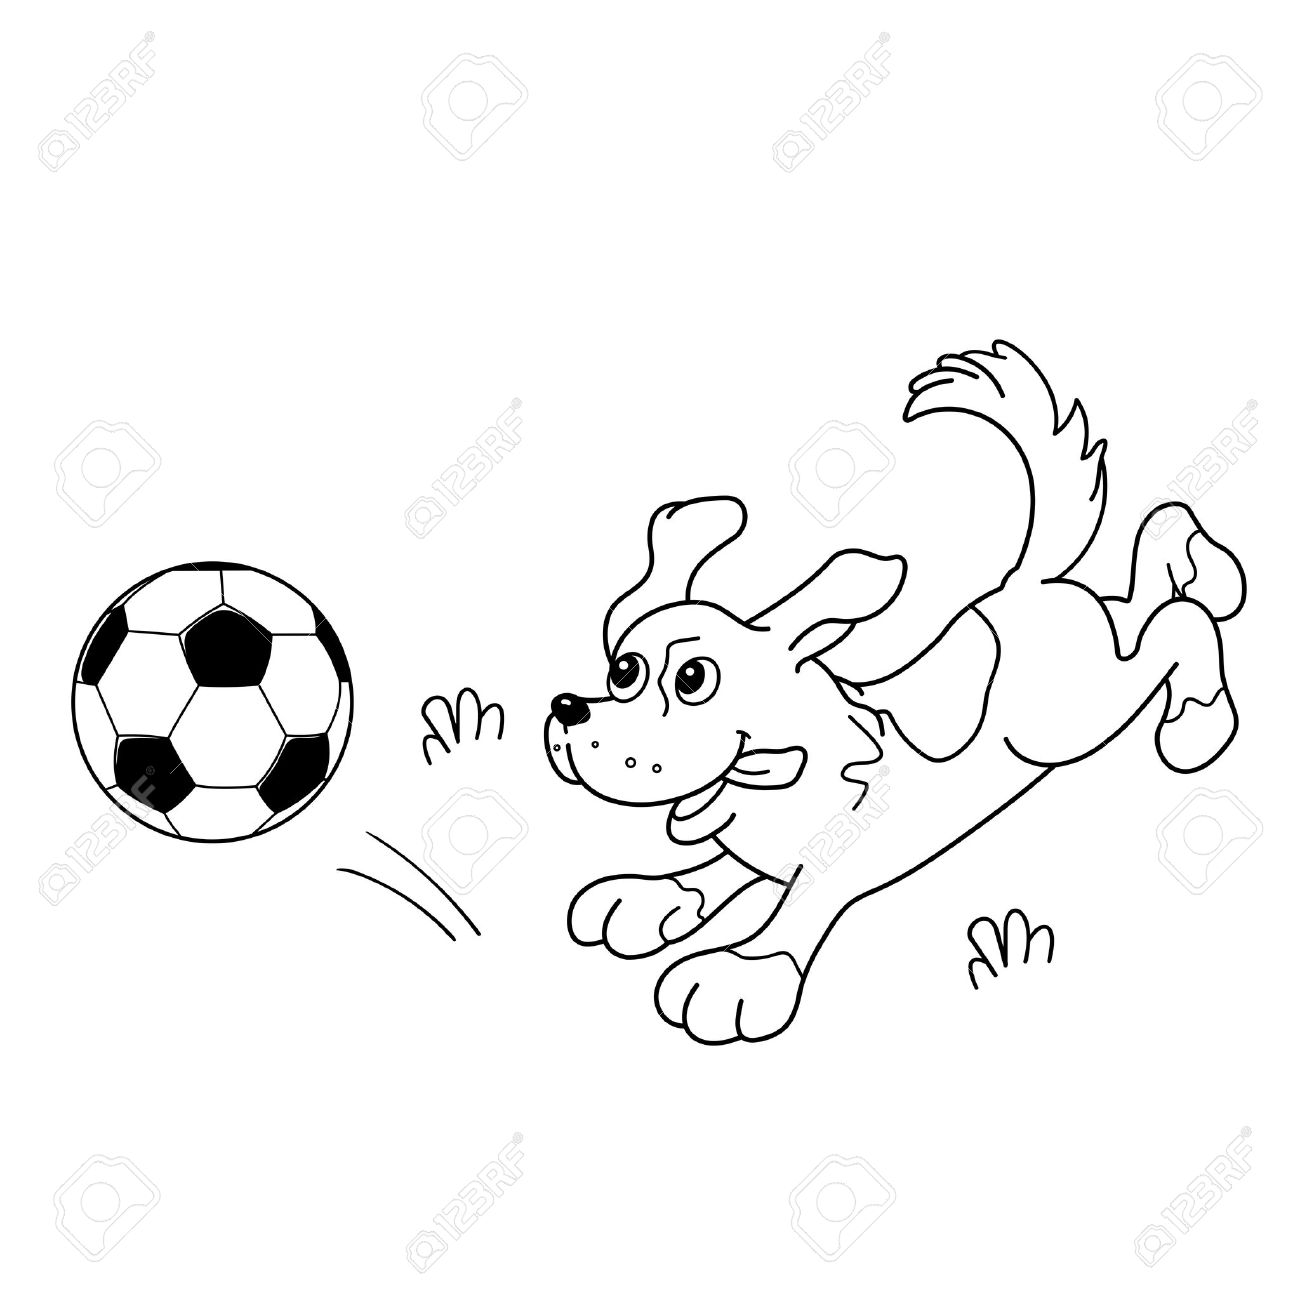 Futbol Sala Dibujos Para Colorear. Elegant Soccer Player Soccer ...